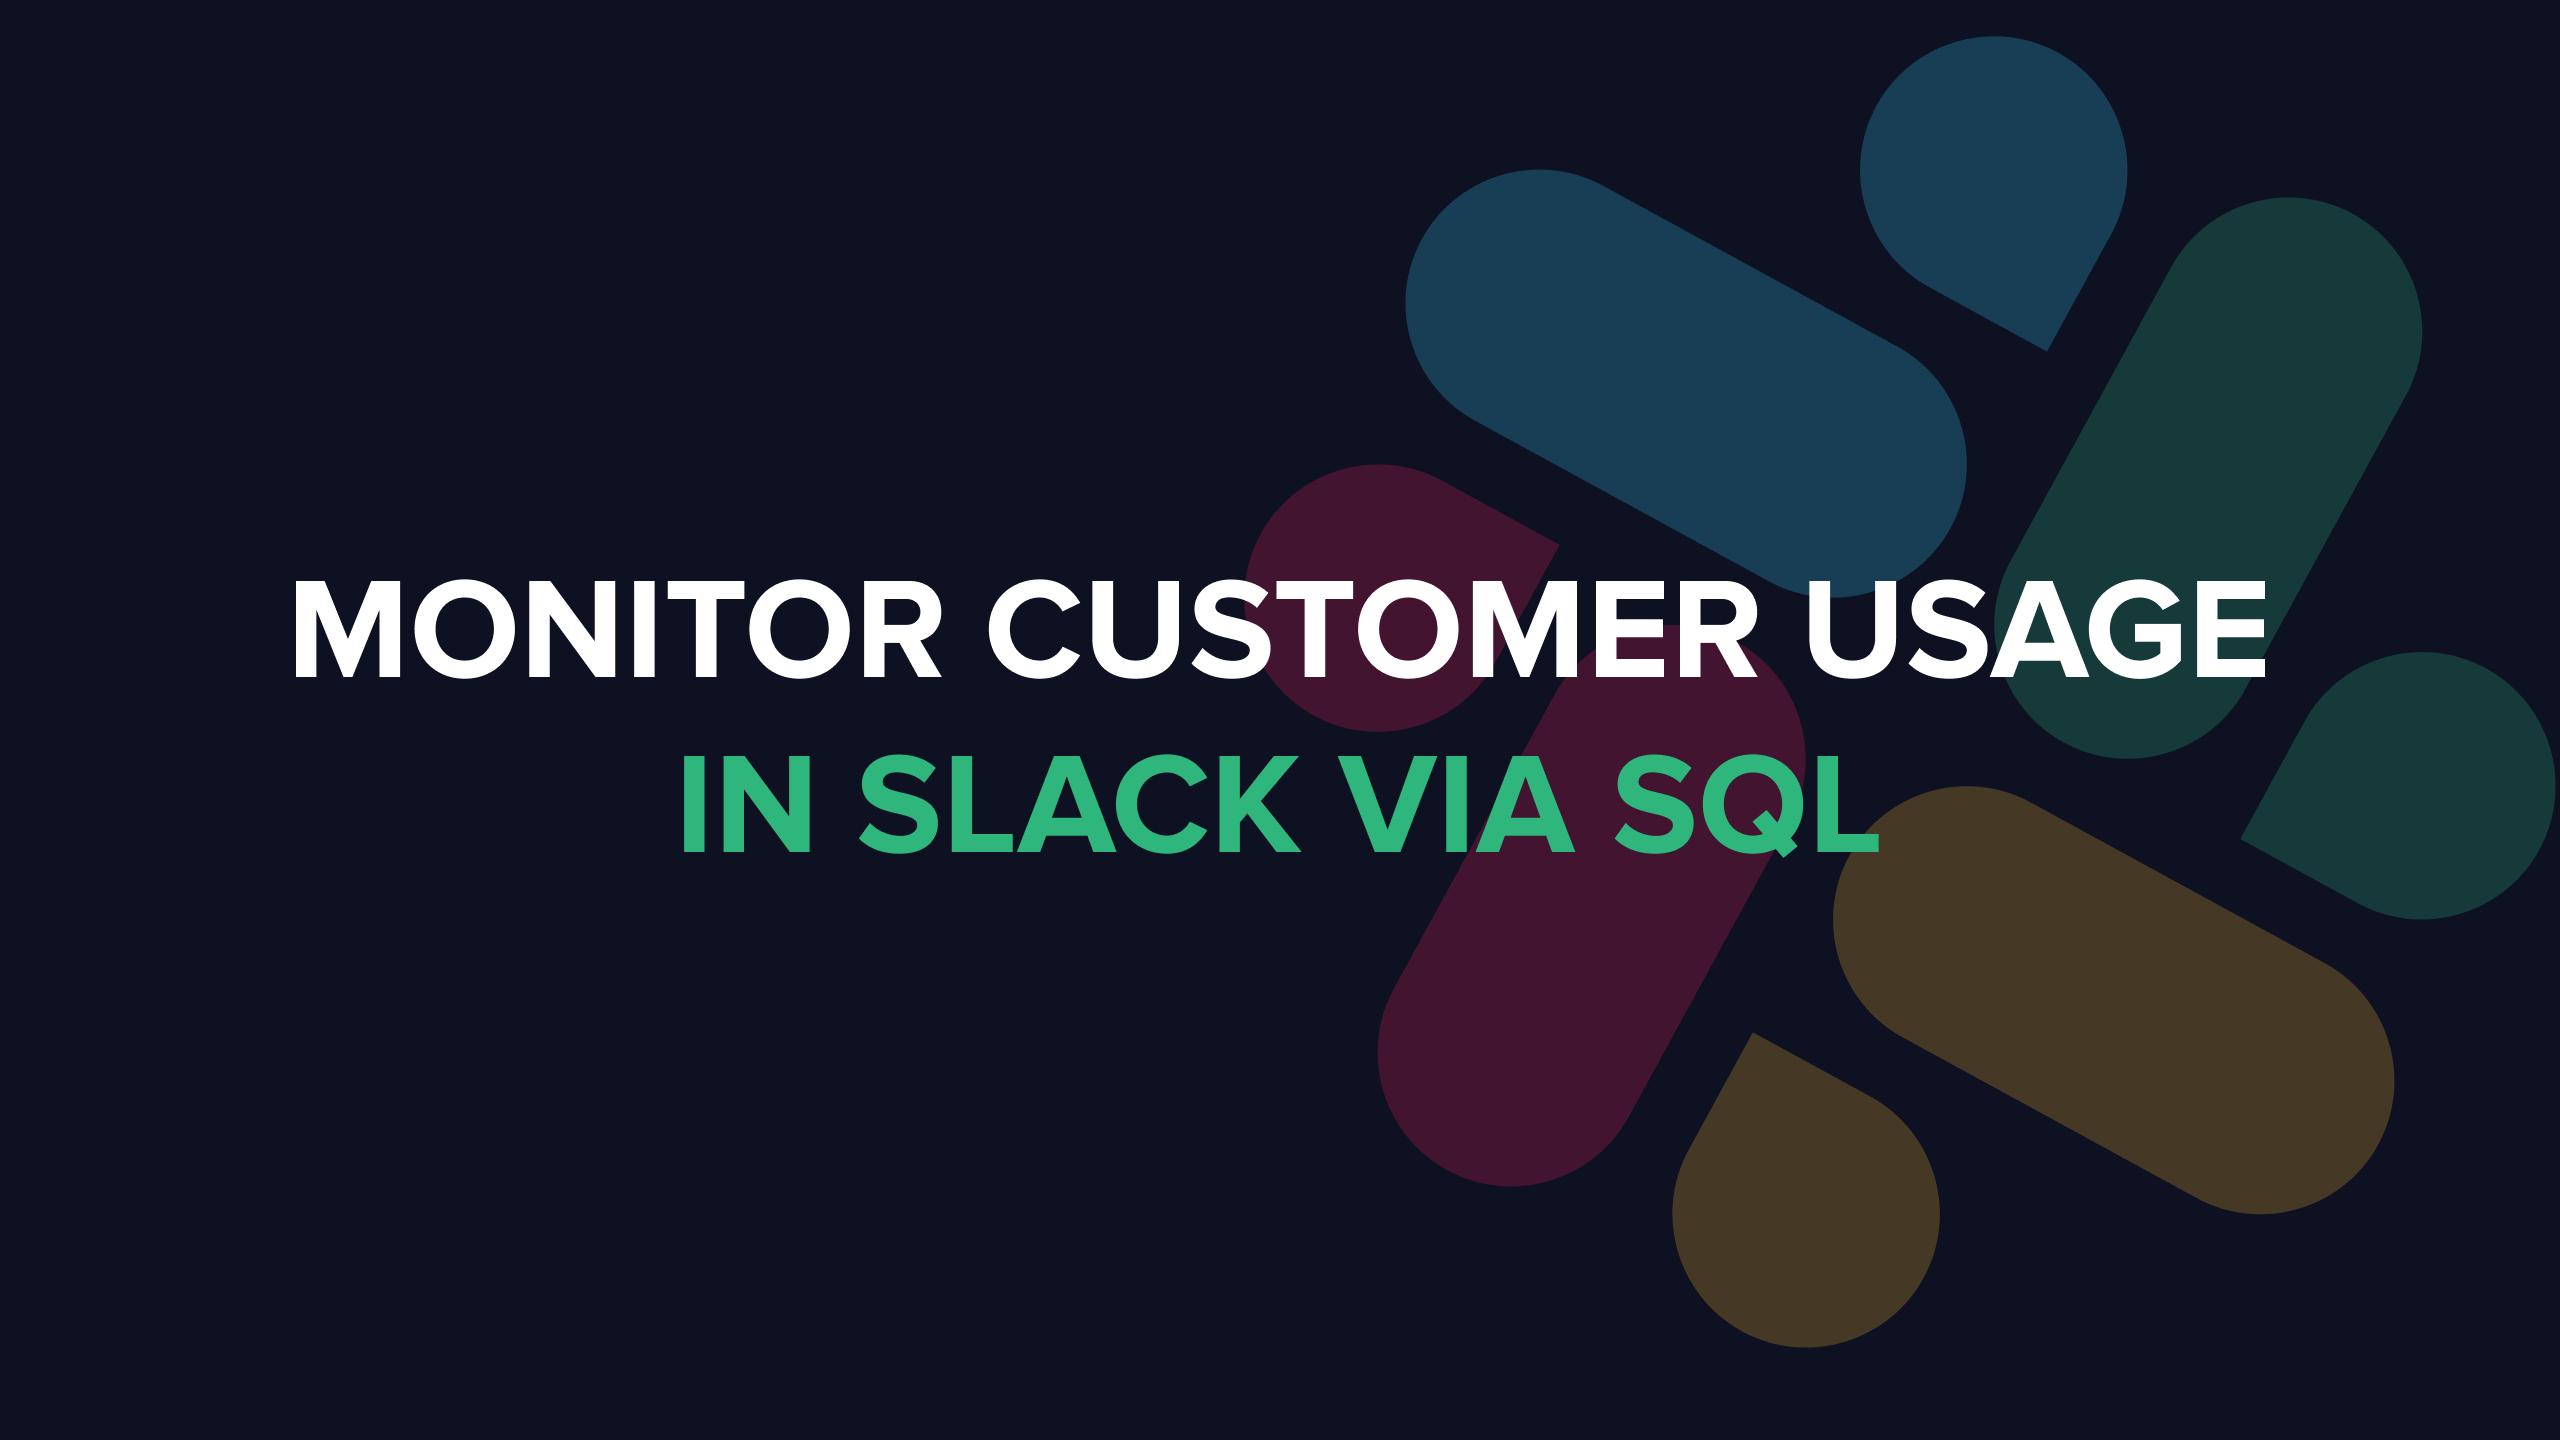 How to monitor customer usage in Slack via SQL